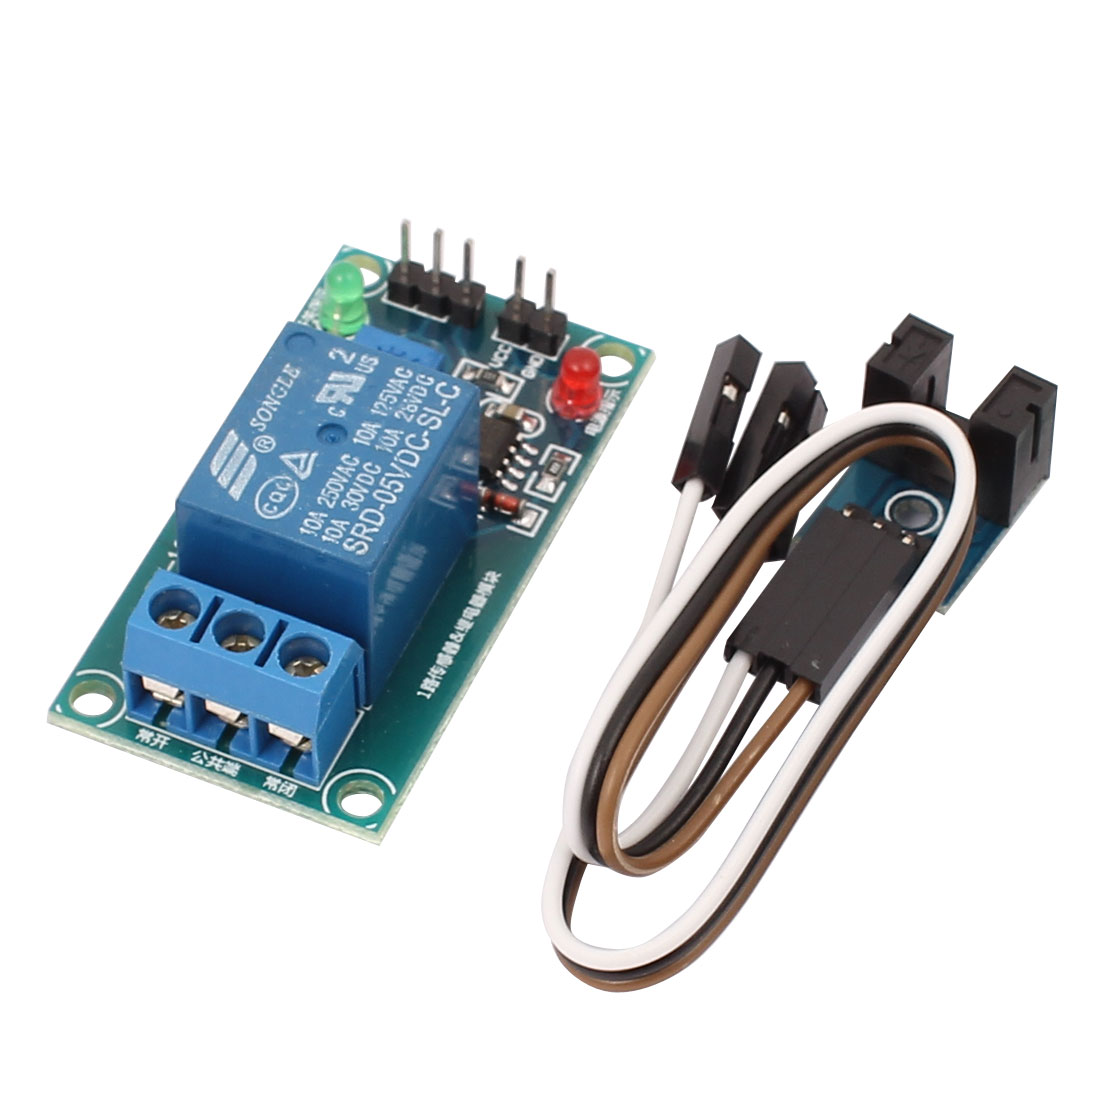 DC 5V SRD-05VDC-SL-C Single Channel Potentiometer Optical Sensor Module w Relay